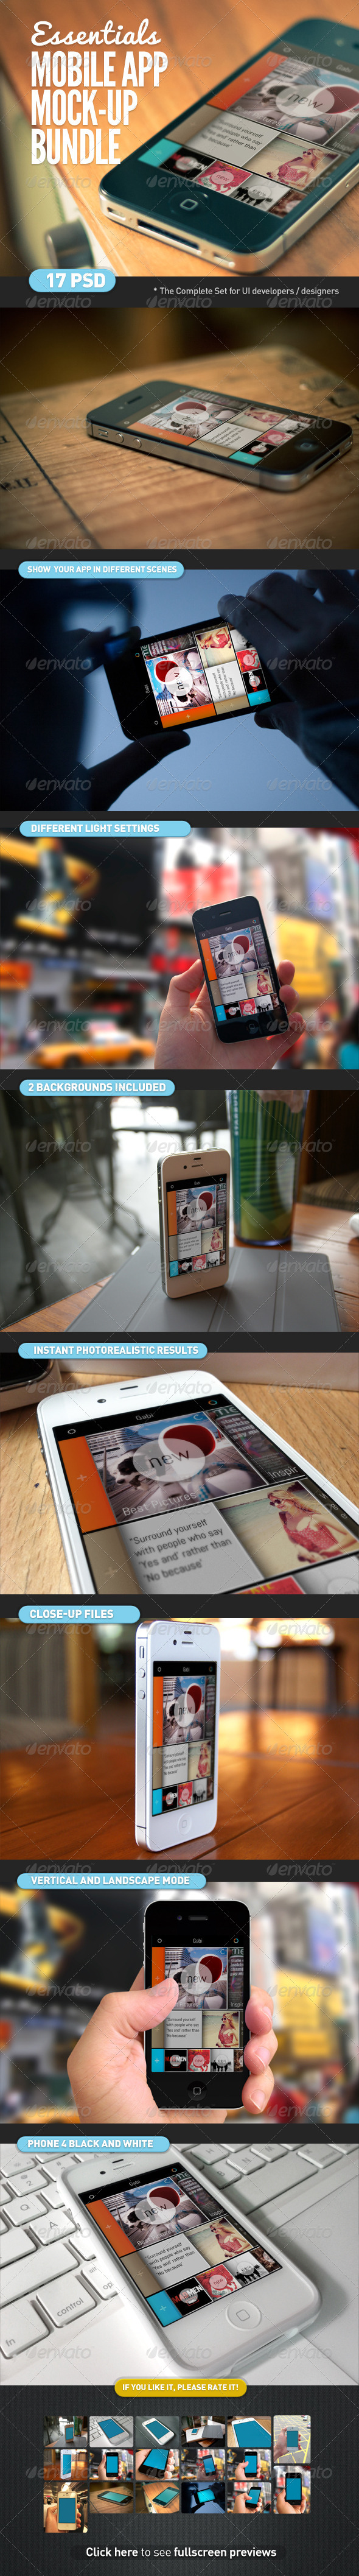 Mobile App | Screen Mock-Up Essentials Bundle